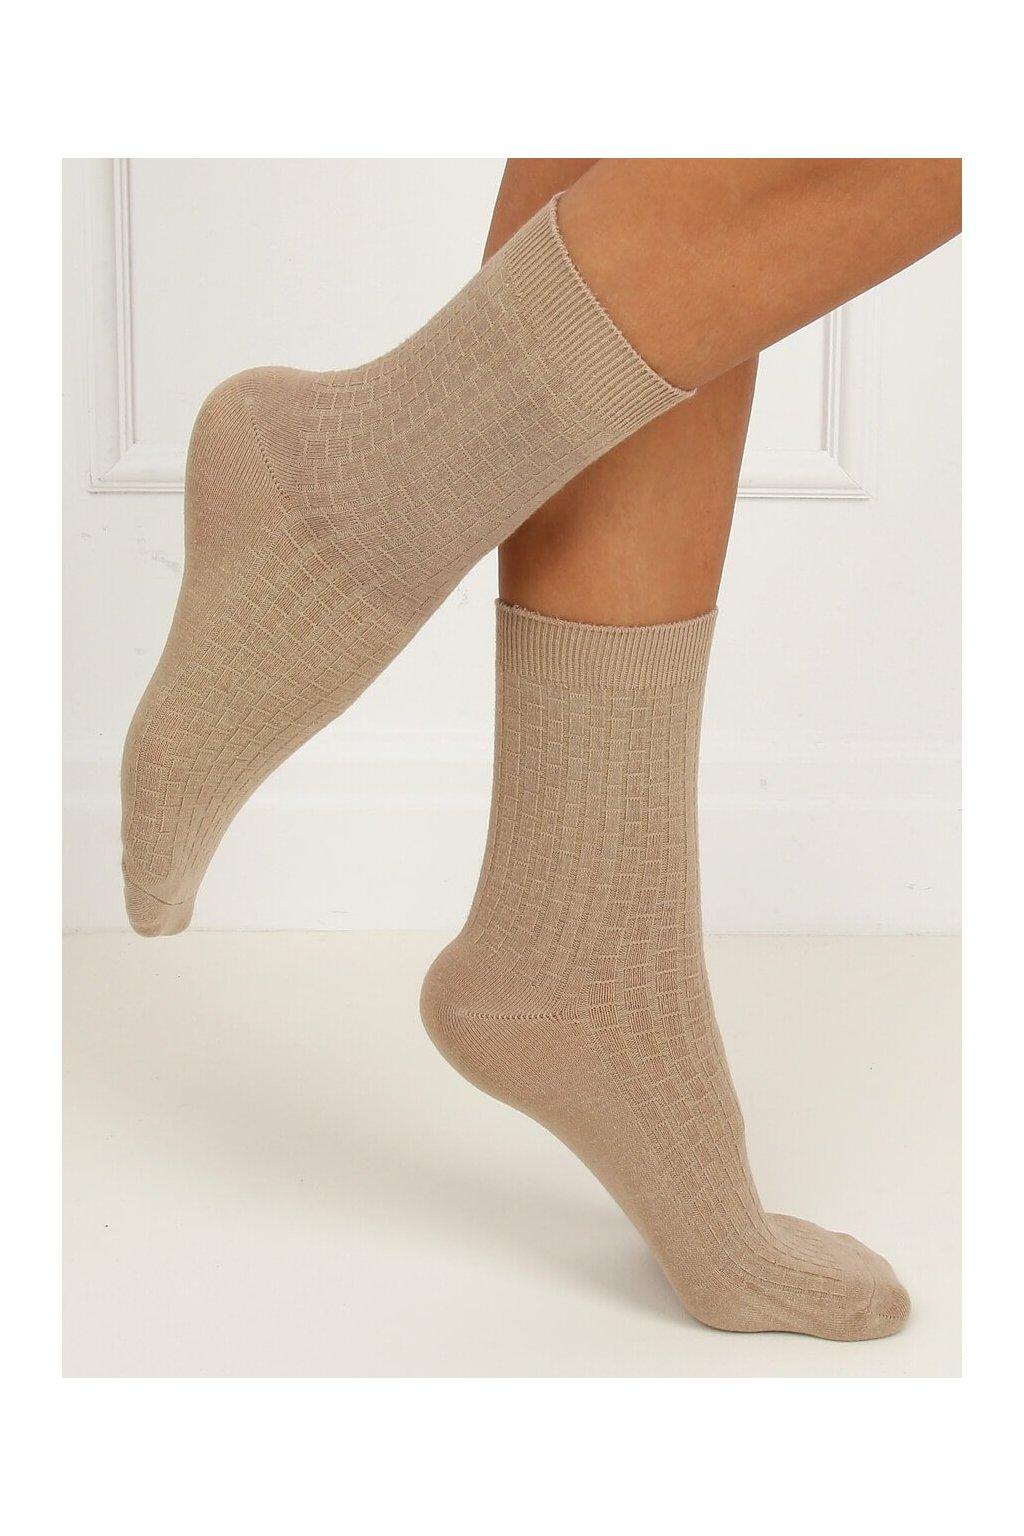 Damske ponožky hnedé SK-N8808